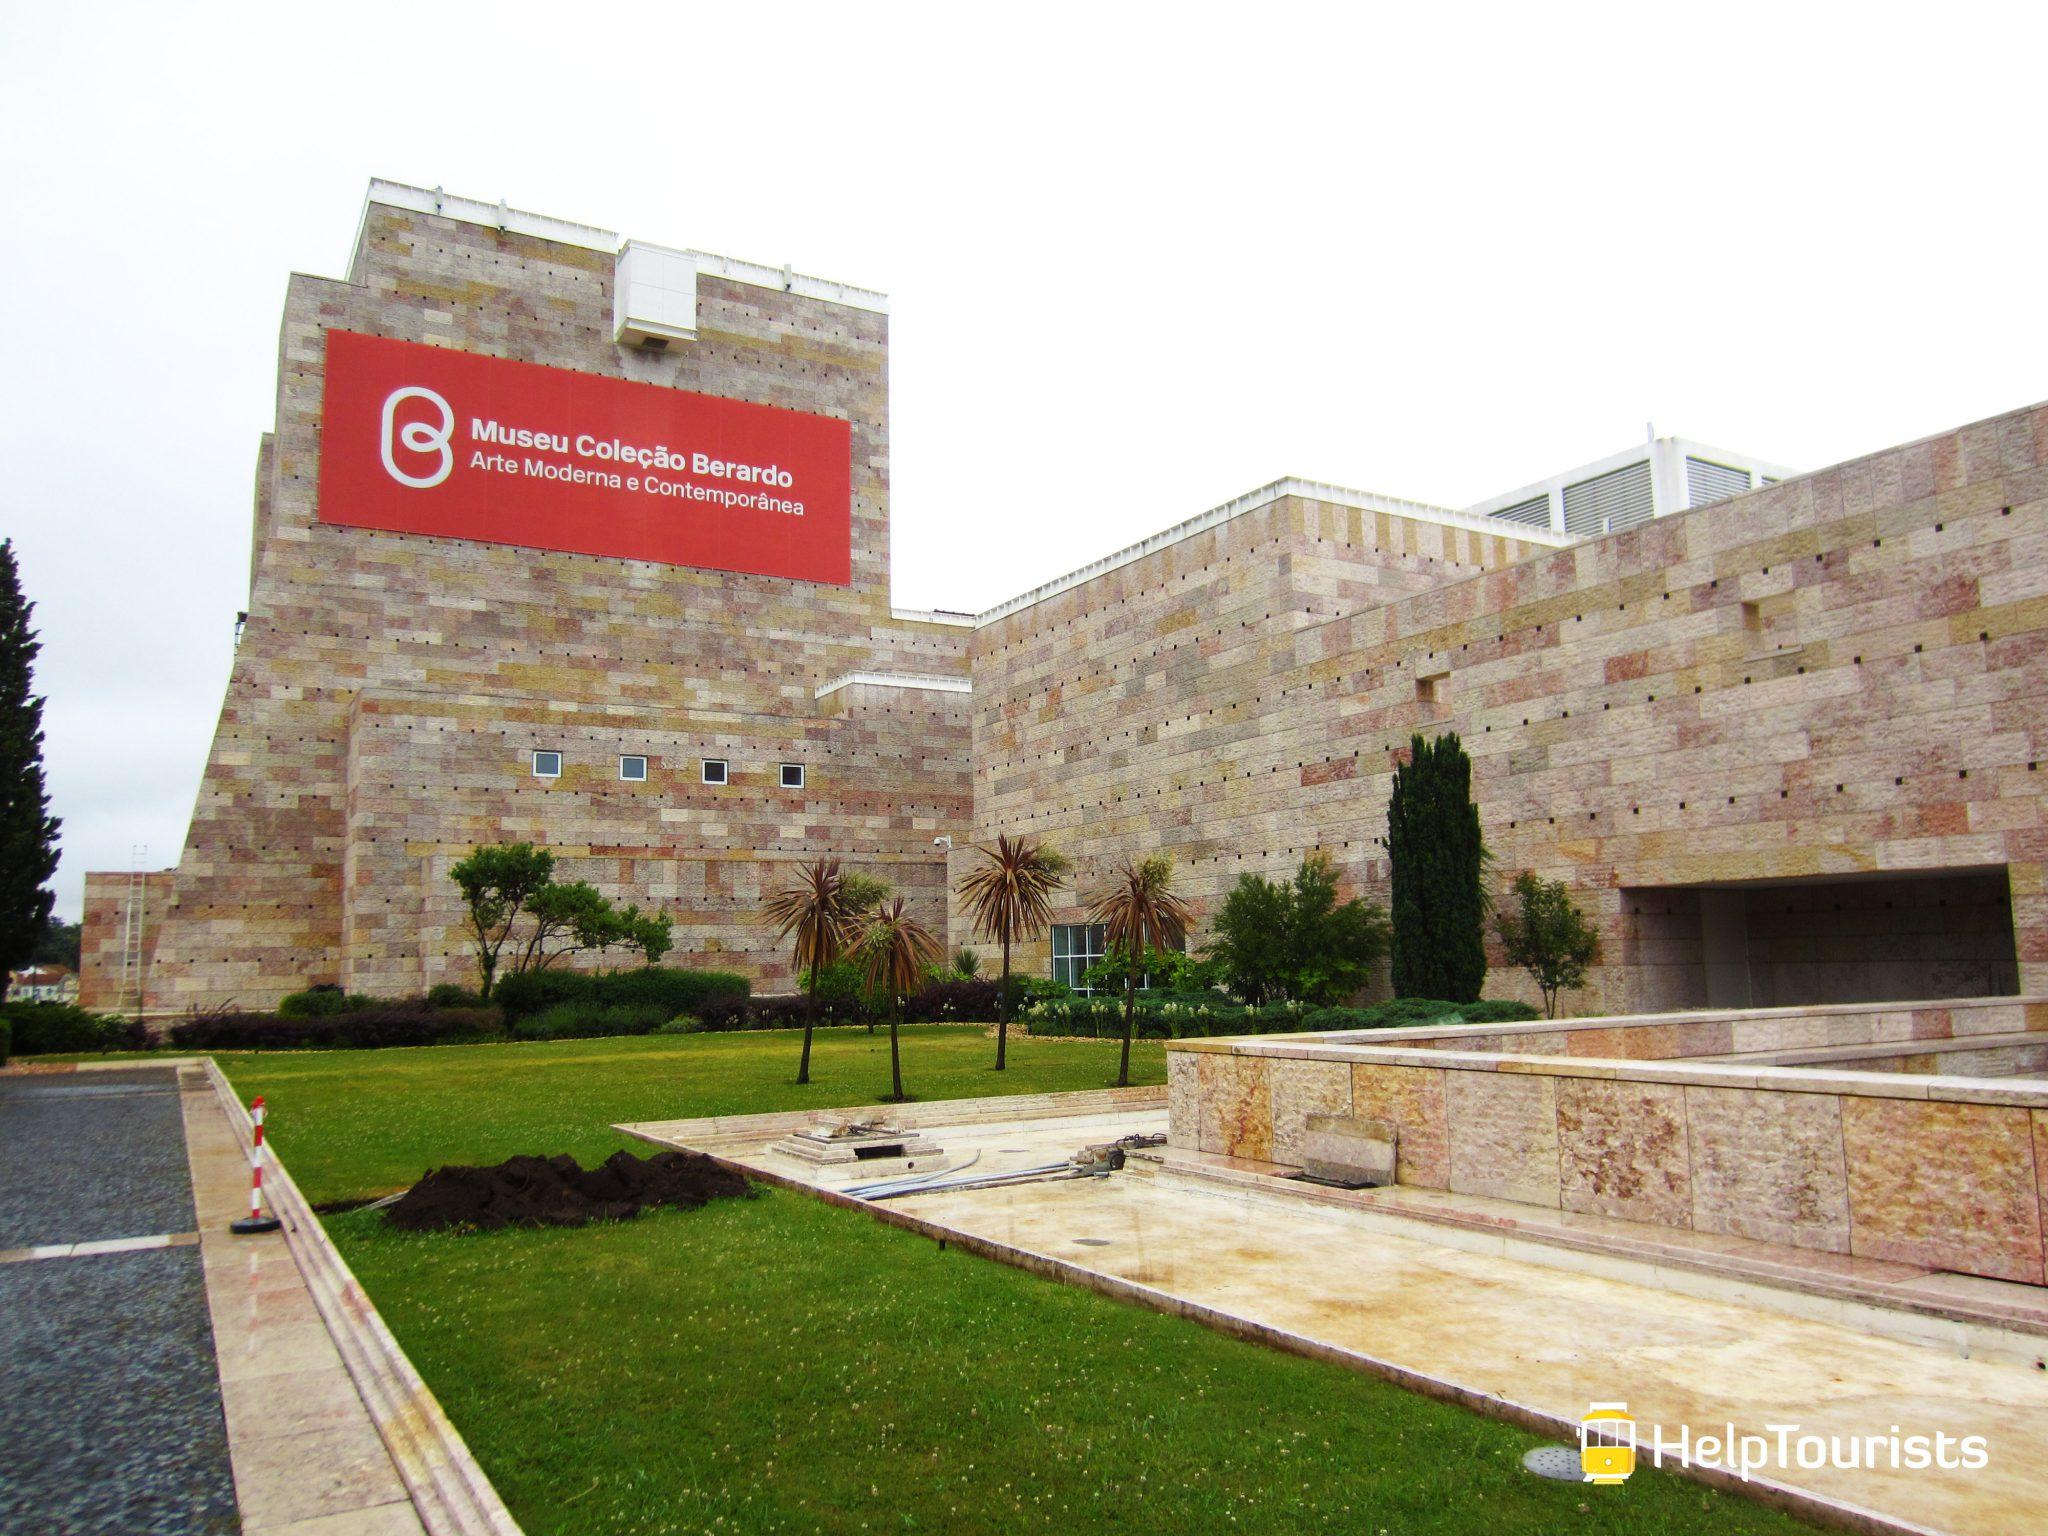 LISSABON_Museu-Colecao-Berardo_Museum-moderne-Kunst_l